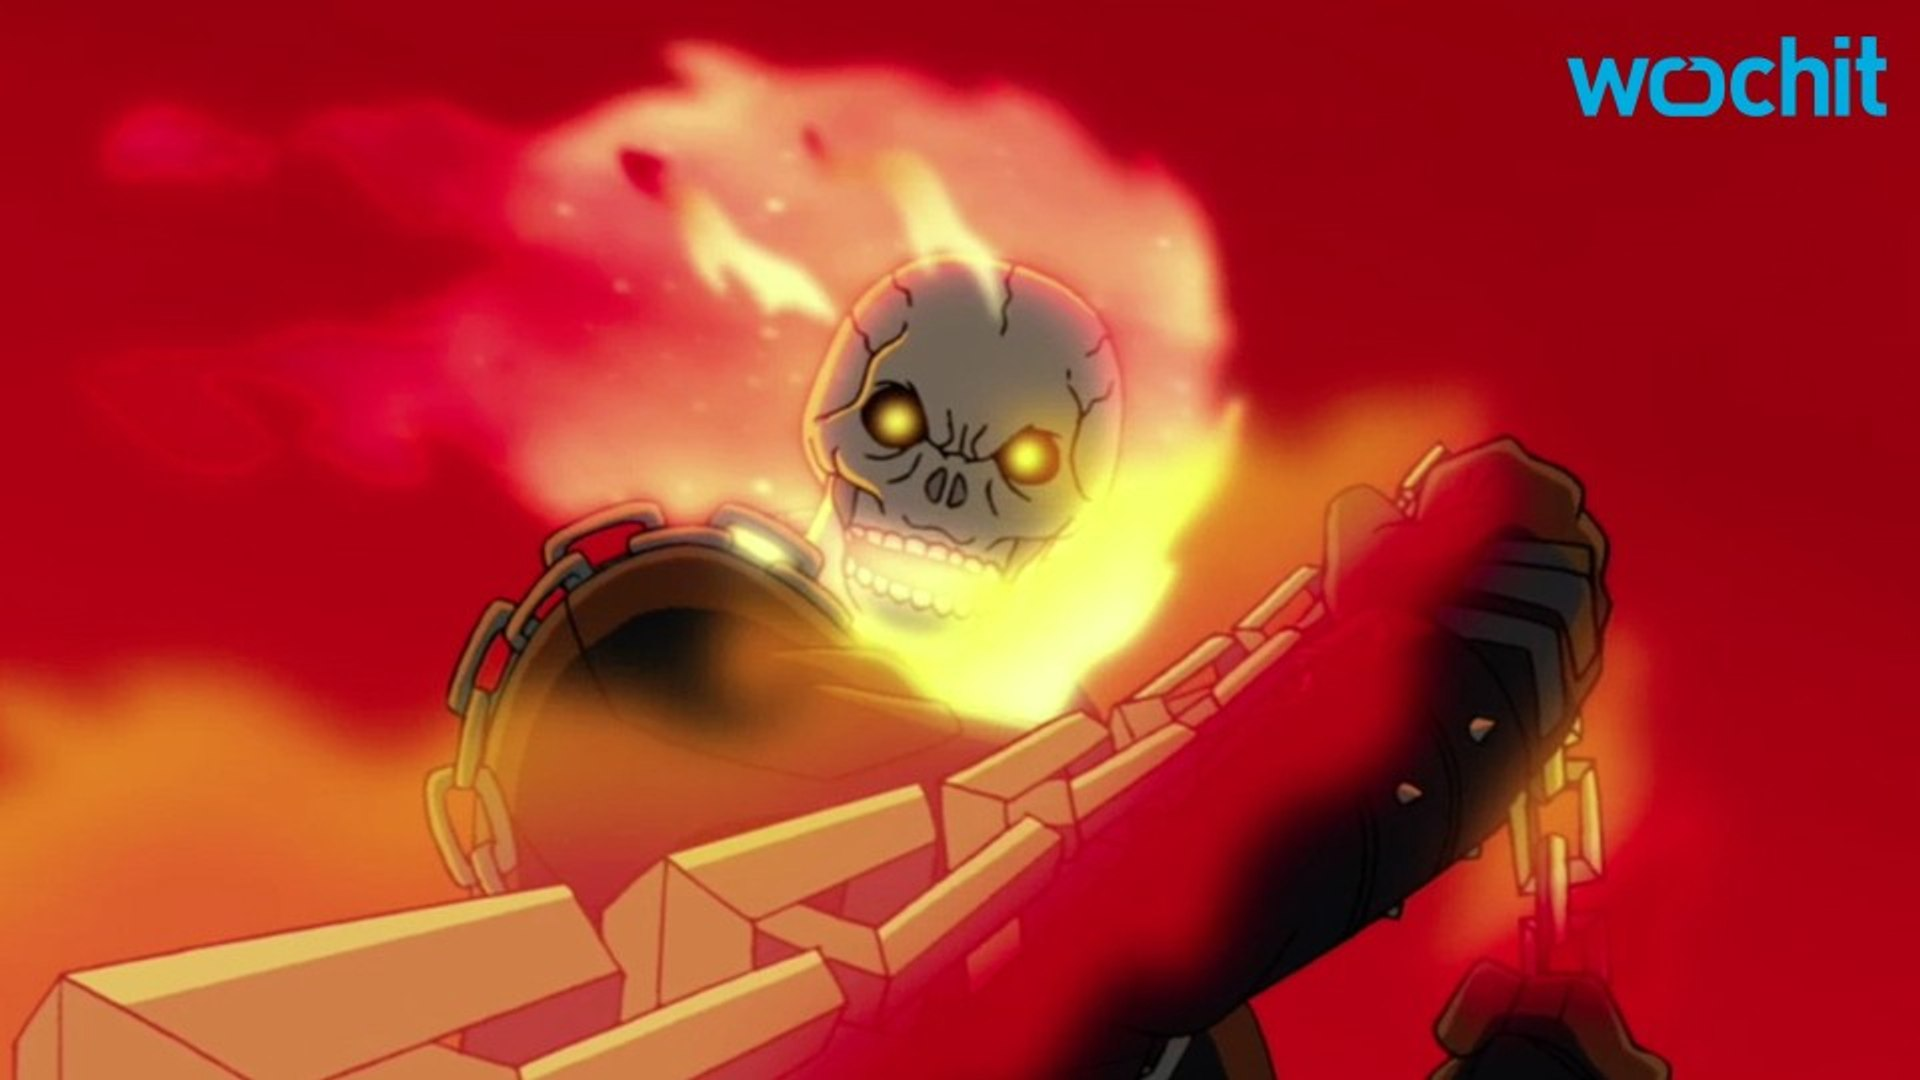 Ghost Rider to Appear in Agents of S.H.I.E.L.D. Season 4?